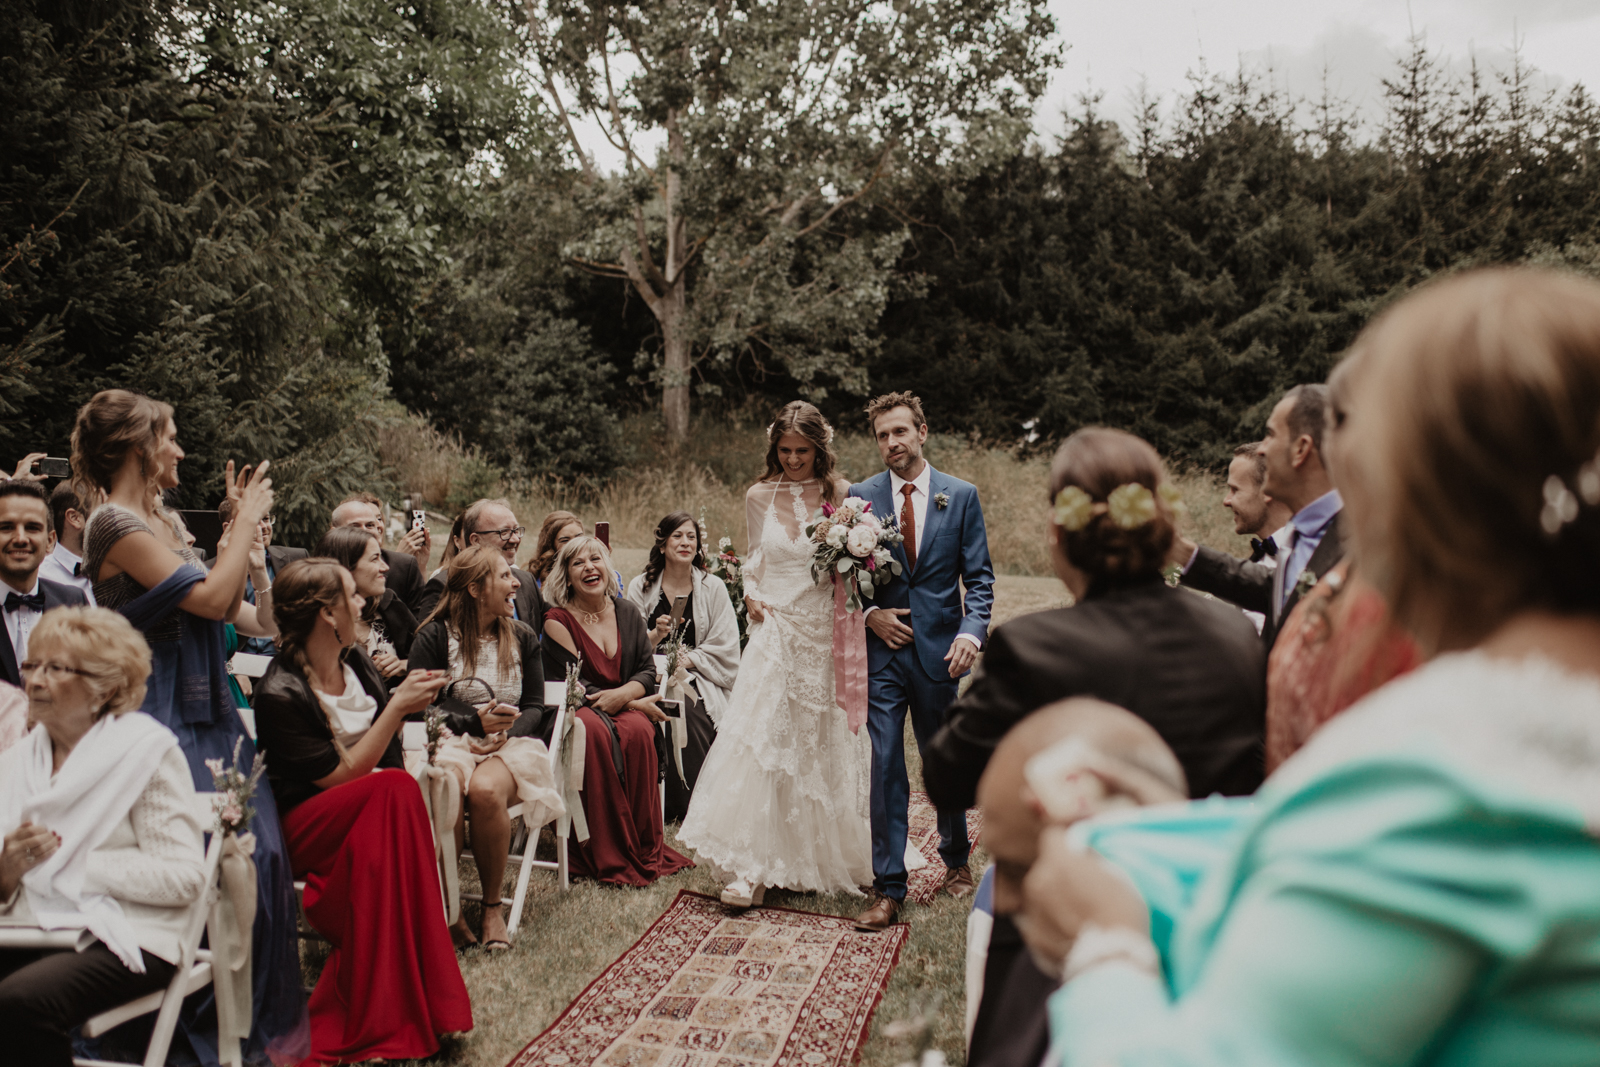 entrada novia, fénix visual, boda boho, boda bohemia, boda en barcelona, boda civil, fénix visual